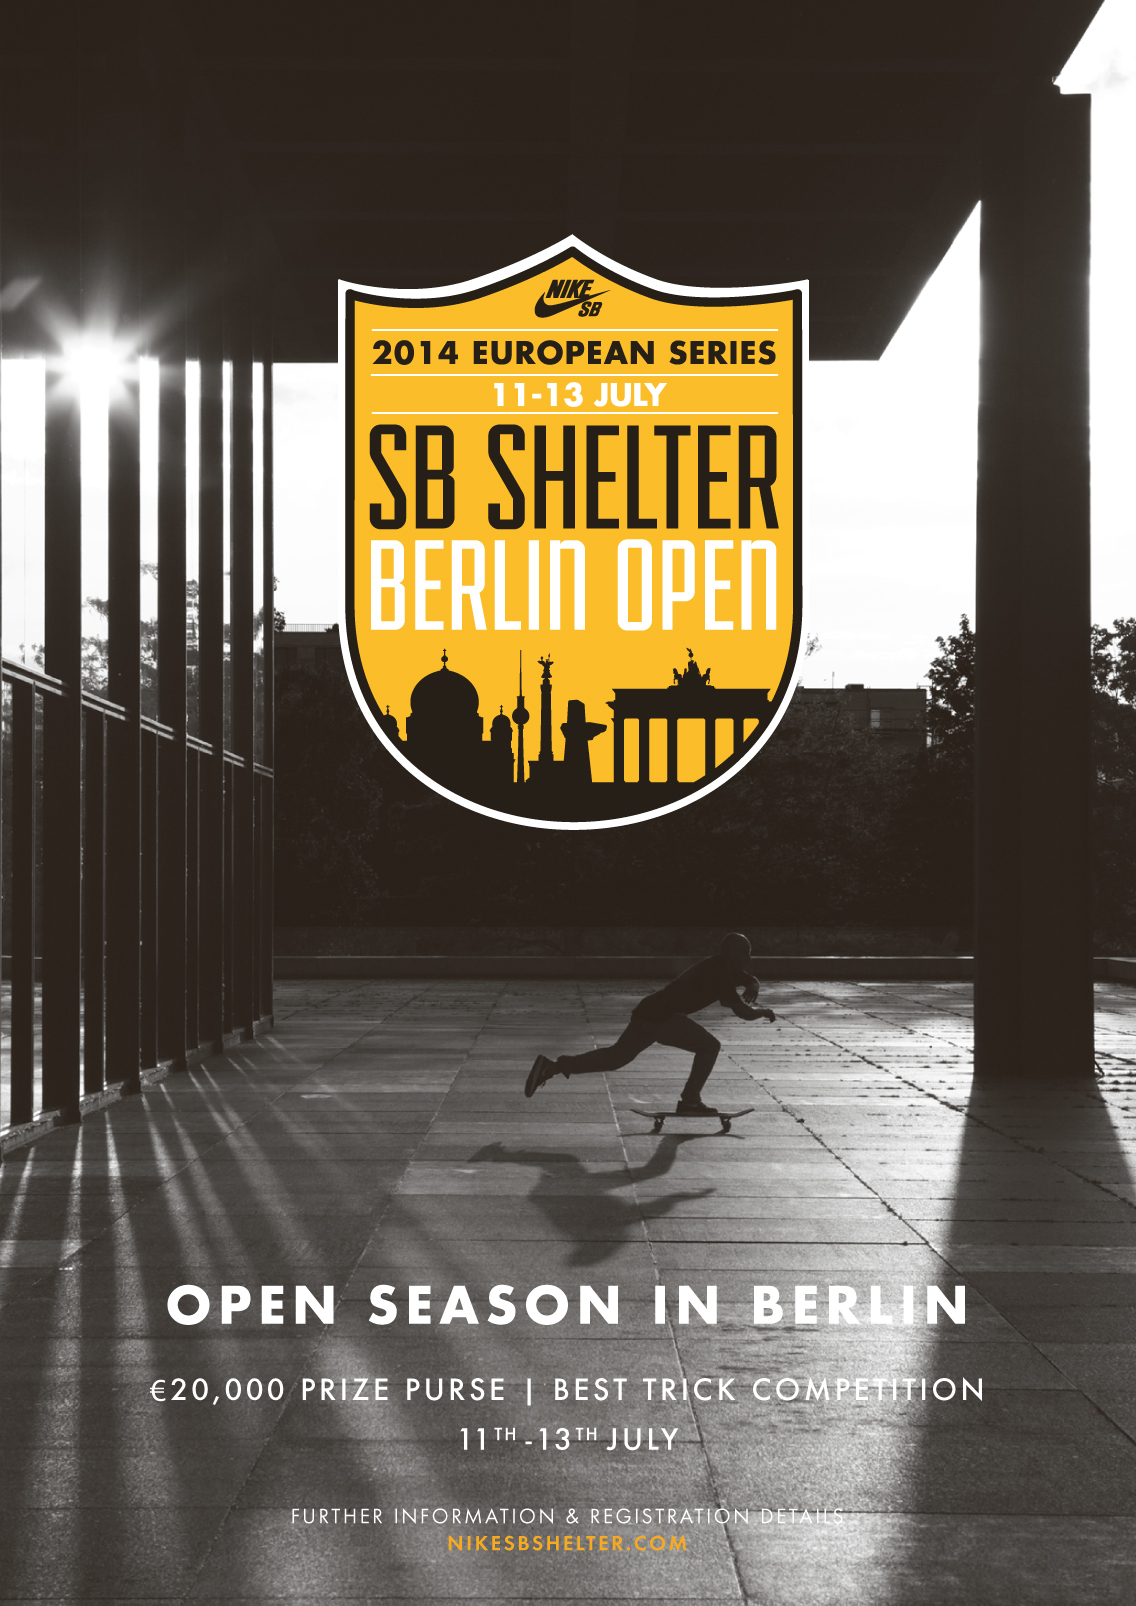 NikeSB_BerlinOpen-DigitalFlyer